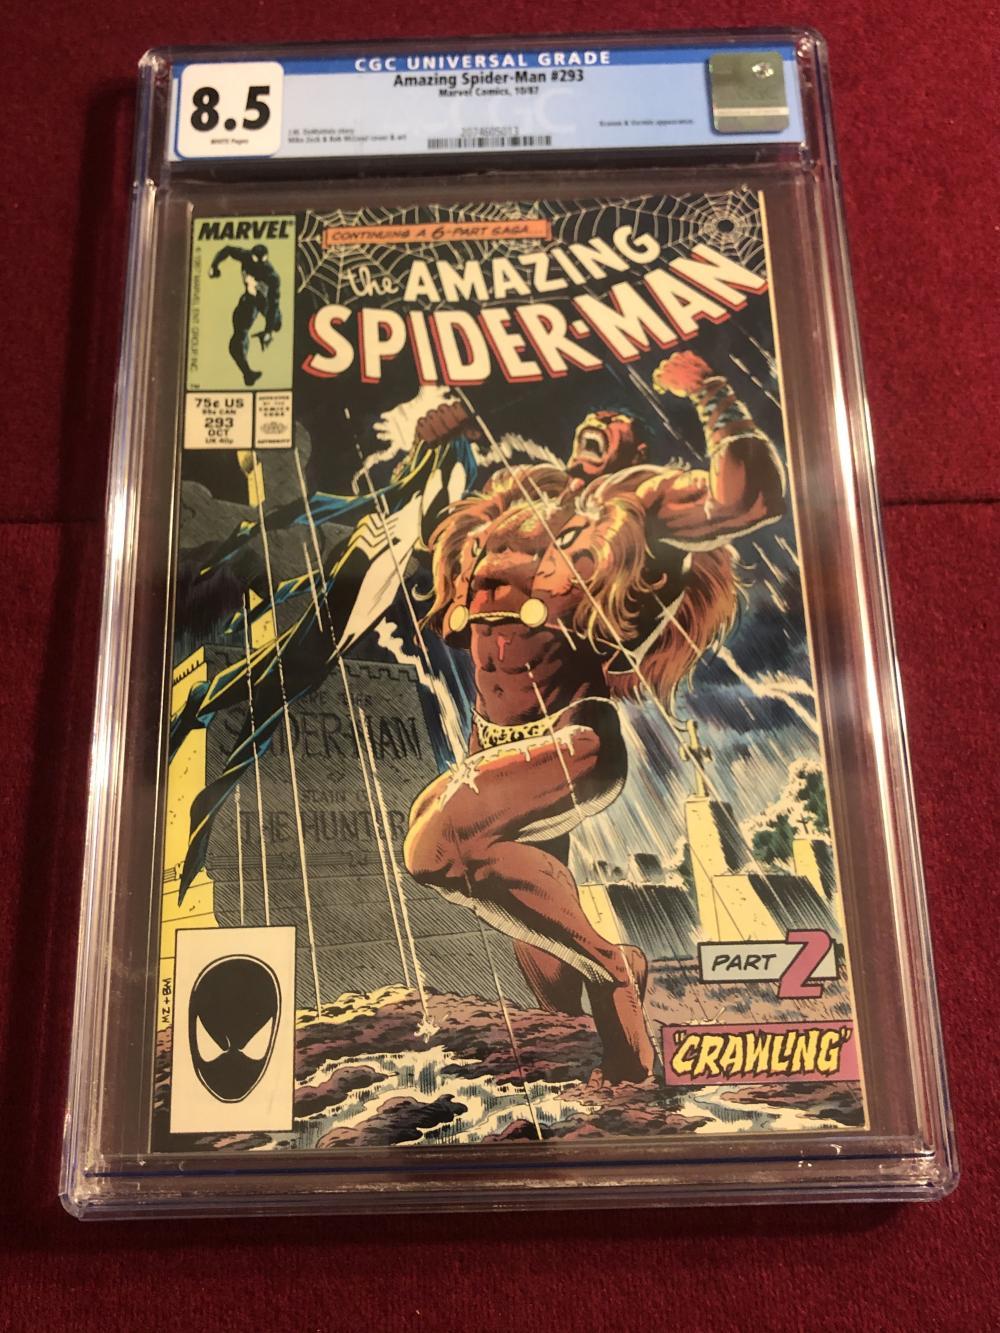 Amazing Spider-man #293 Marvel comic - graded